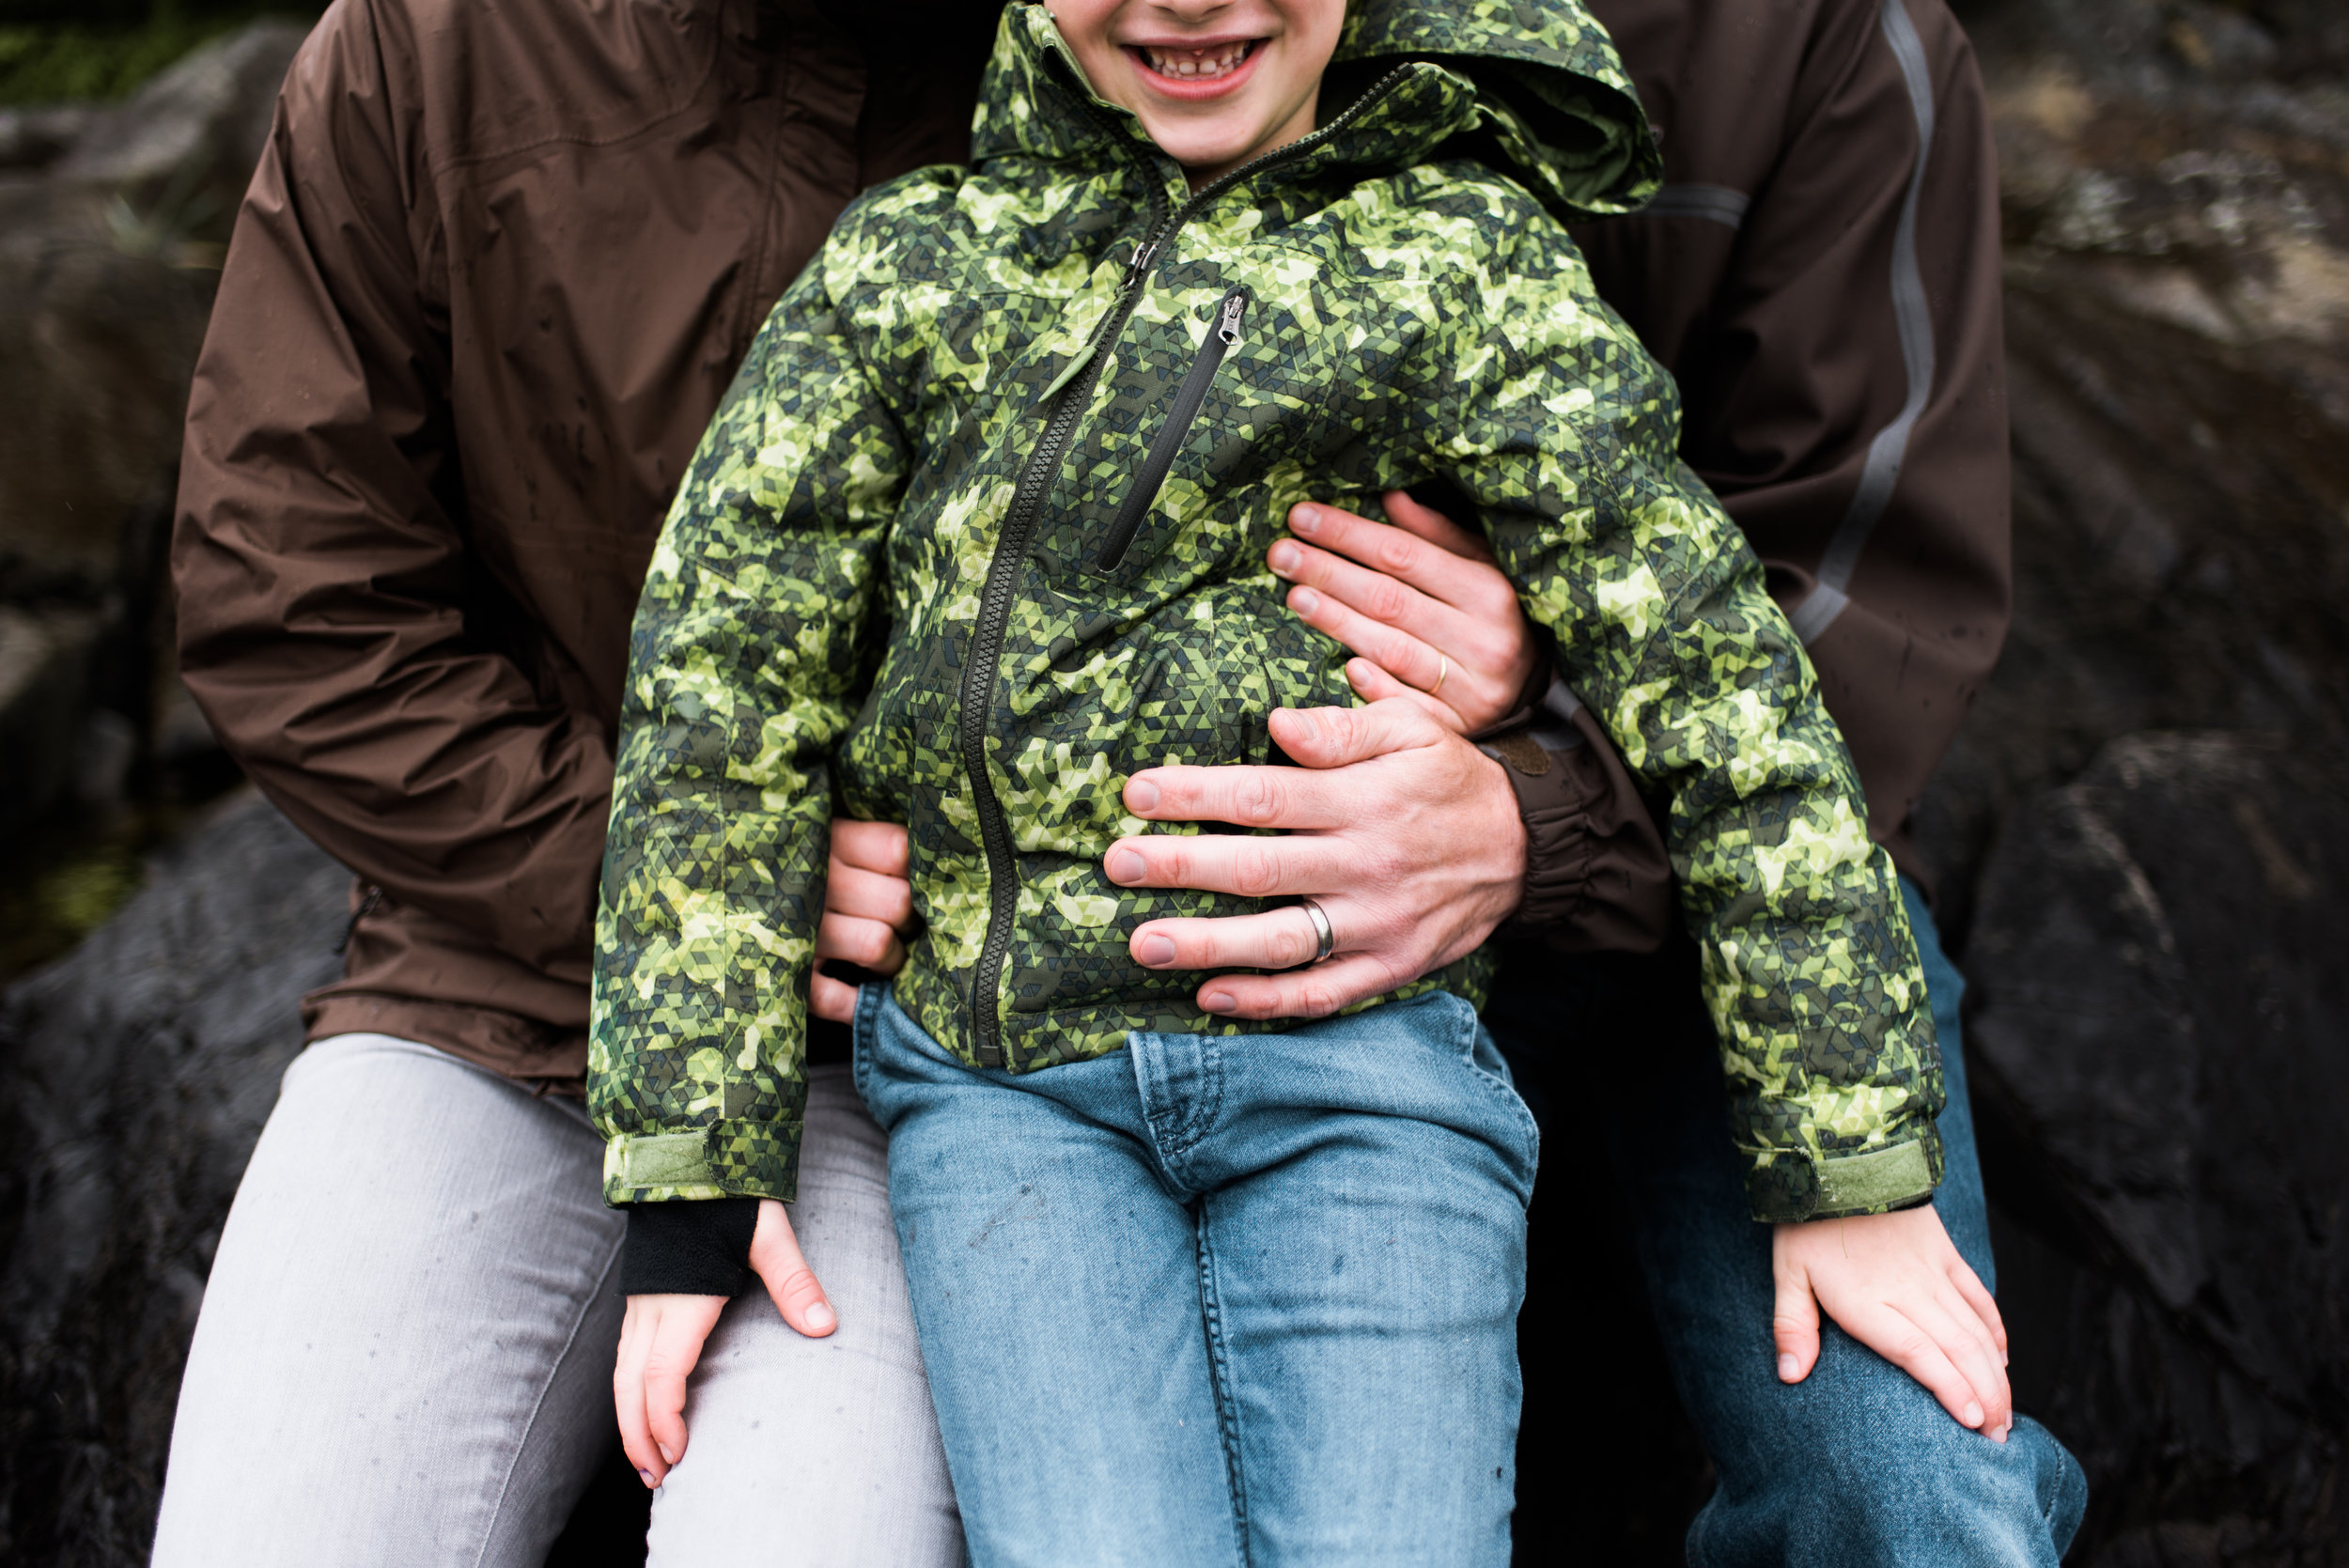 Family photoshoot - Sitka, Alaska - Kendall Rock Photography